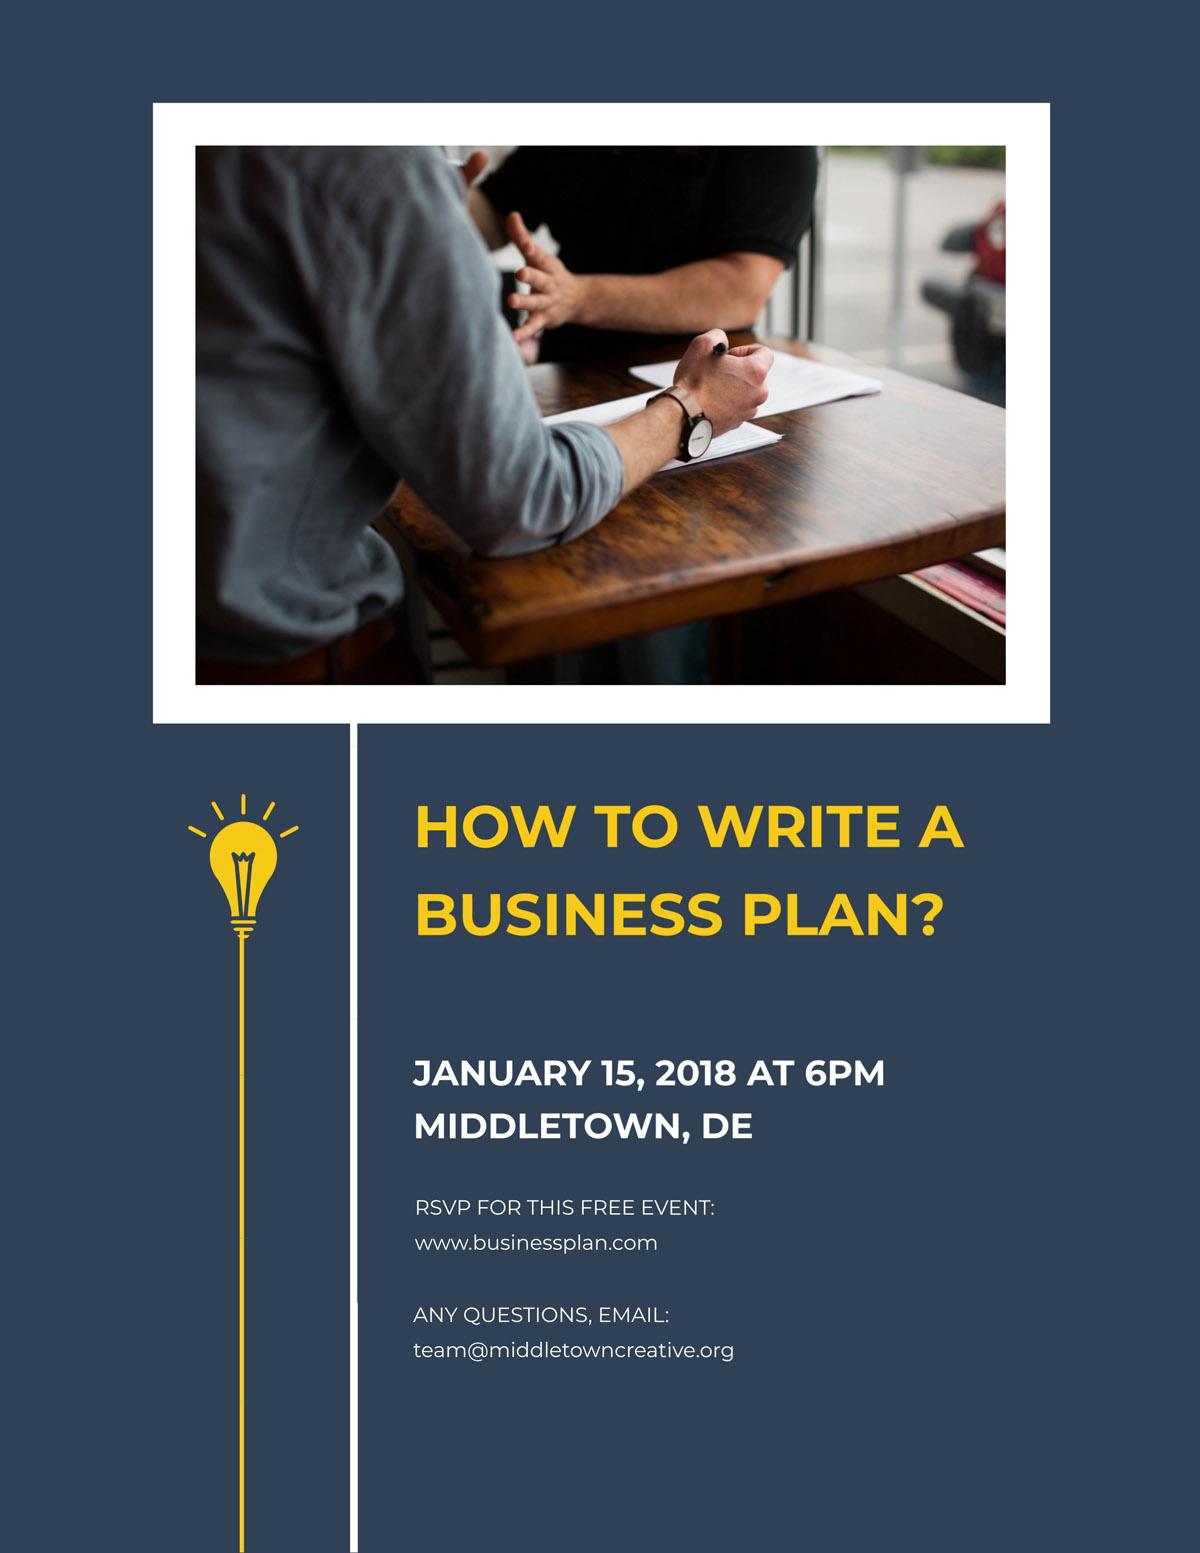 flyer templates - business plan contest workshop